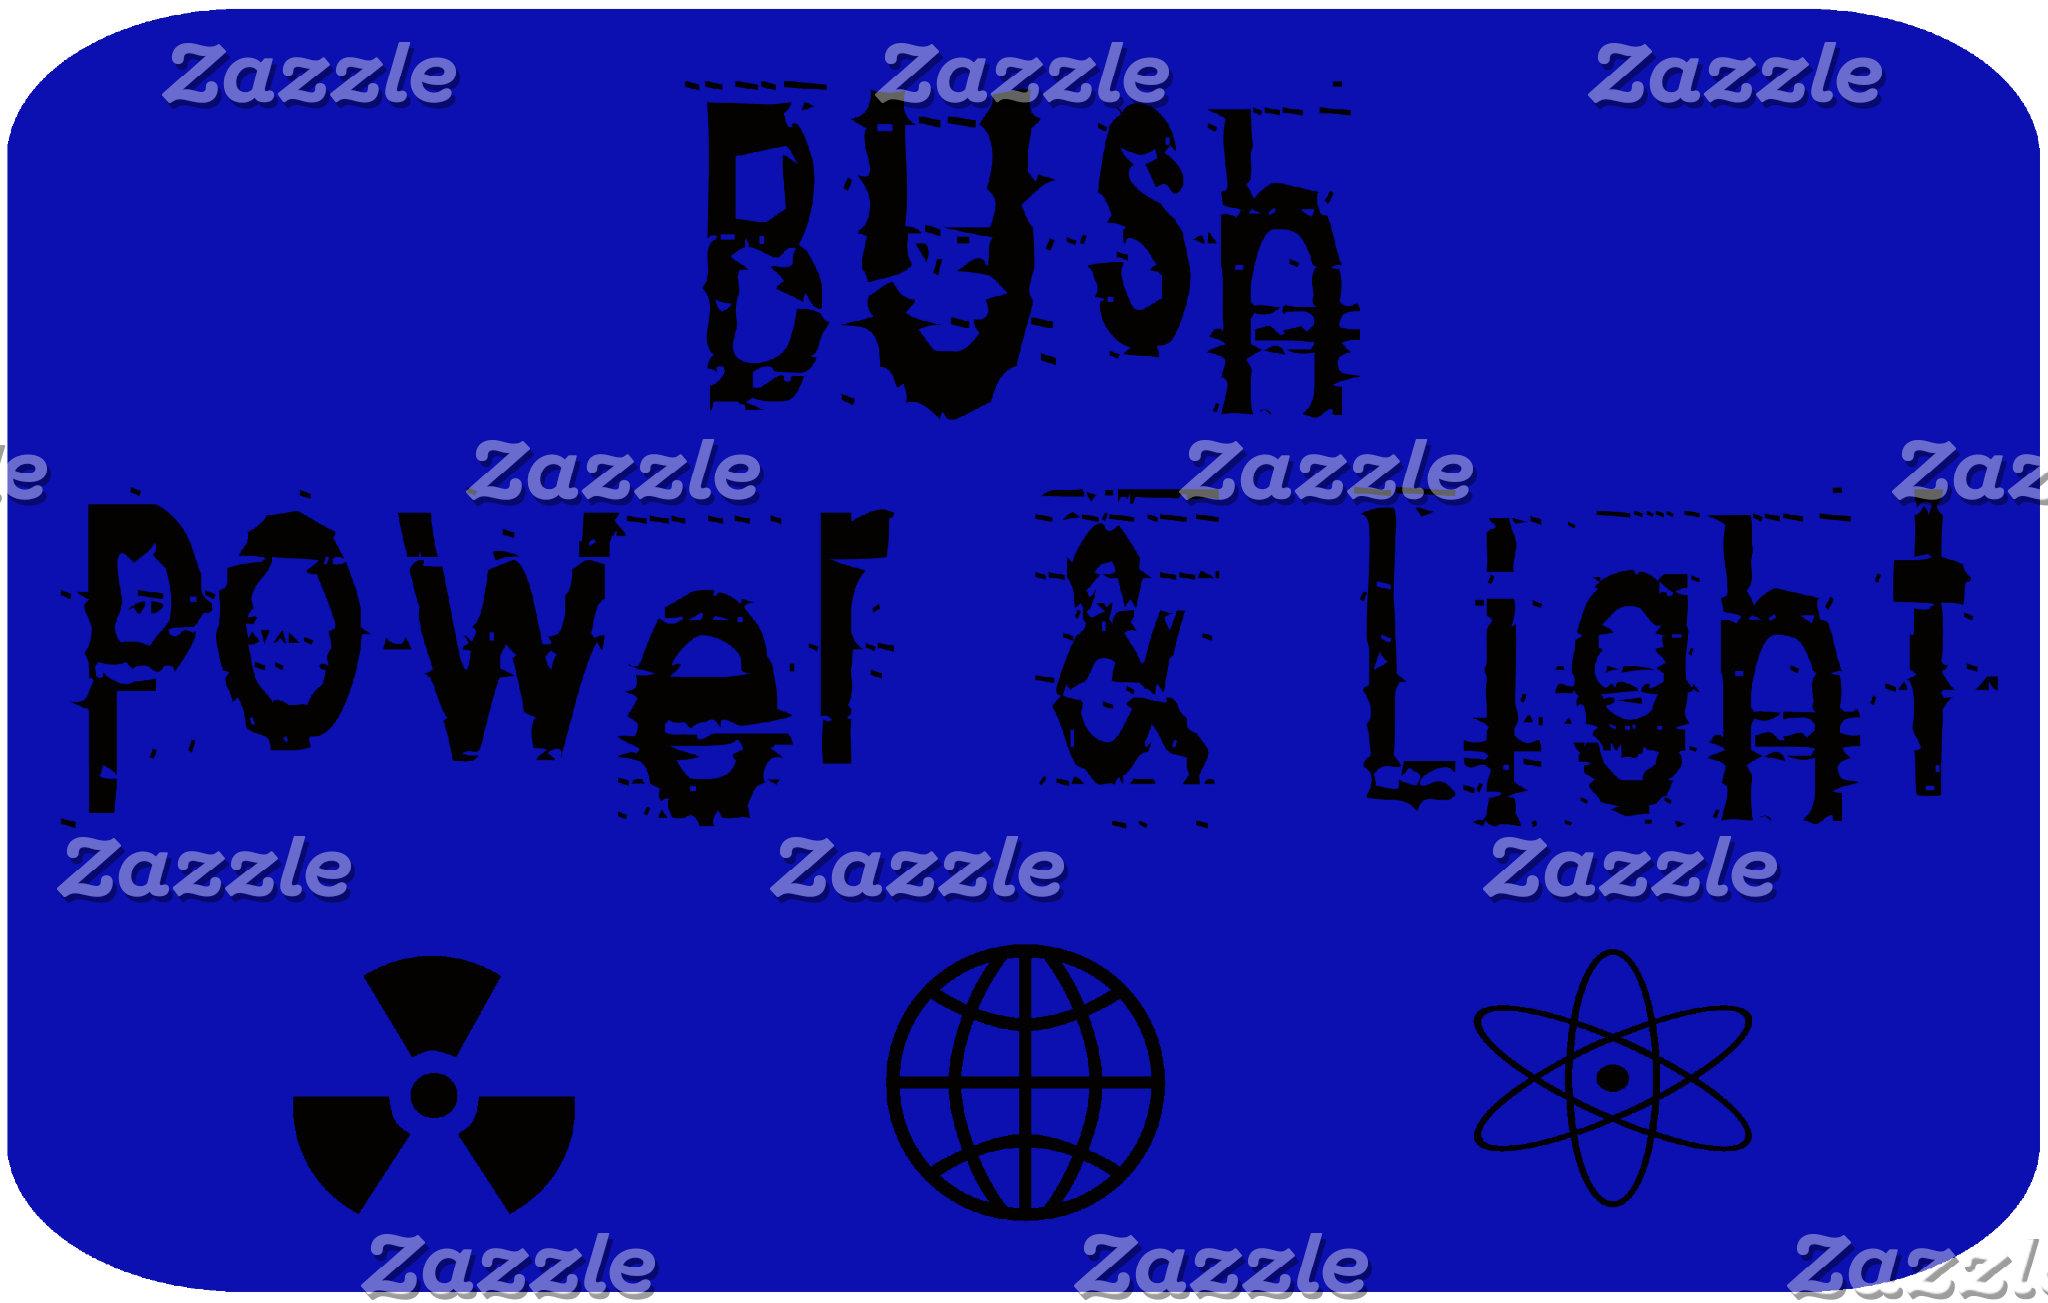 Bush Power and Light